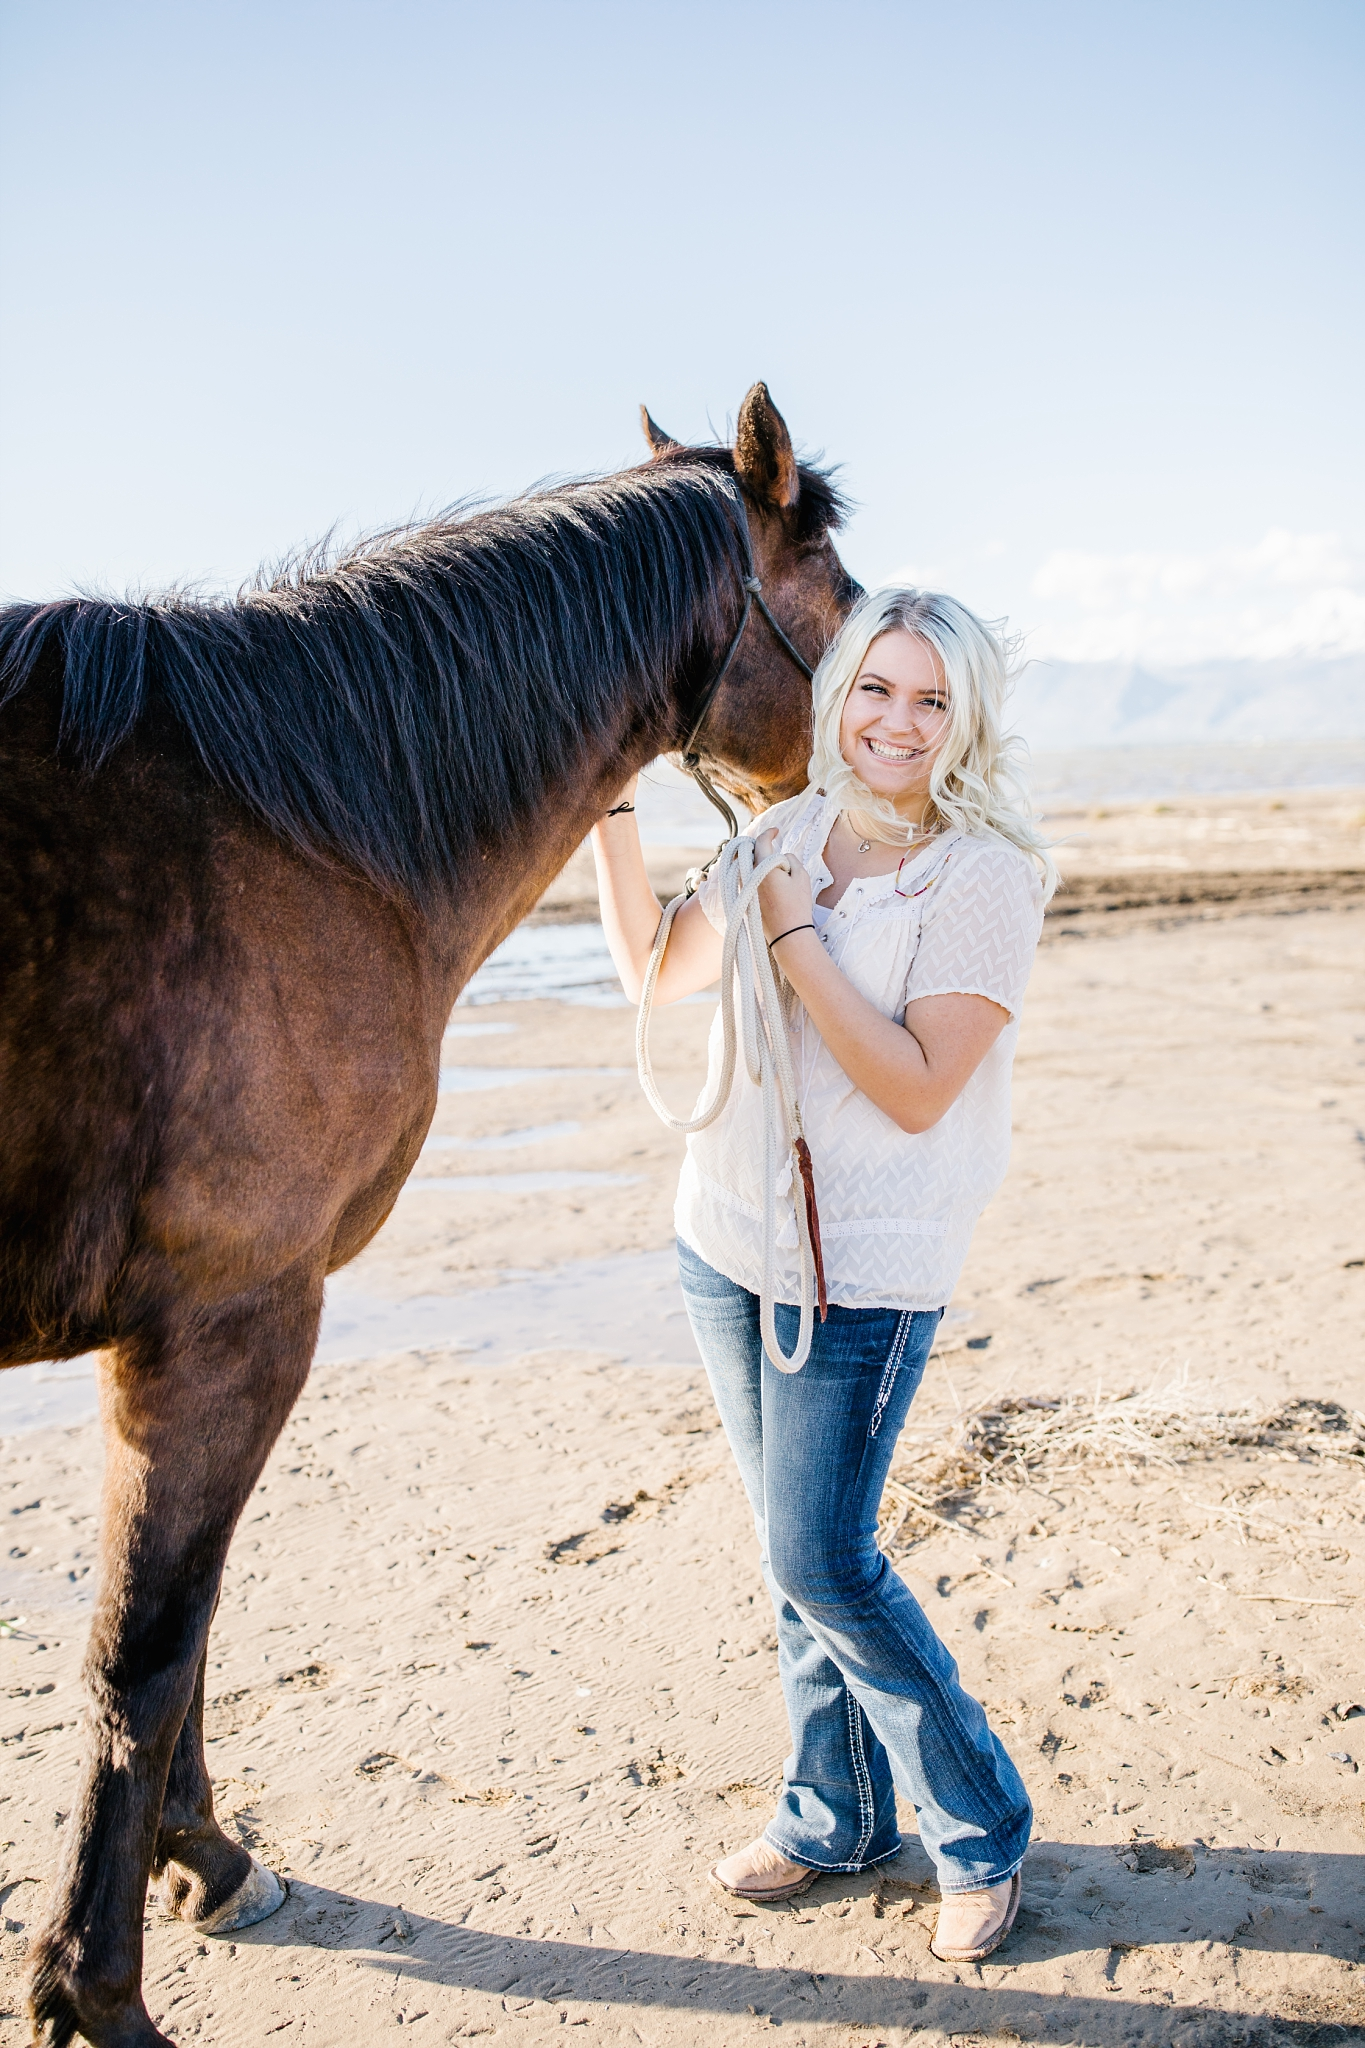 Sydney-69_Lizzie-B-Imagery-Utah-Family-Photographer-Senior-Photography-Park-City-Spanish-Fork-Salt-Lake-City-Utah-County.jpg